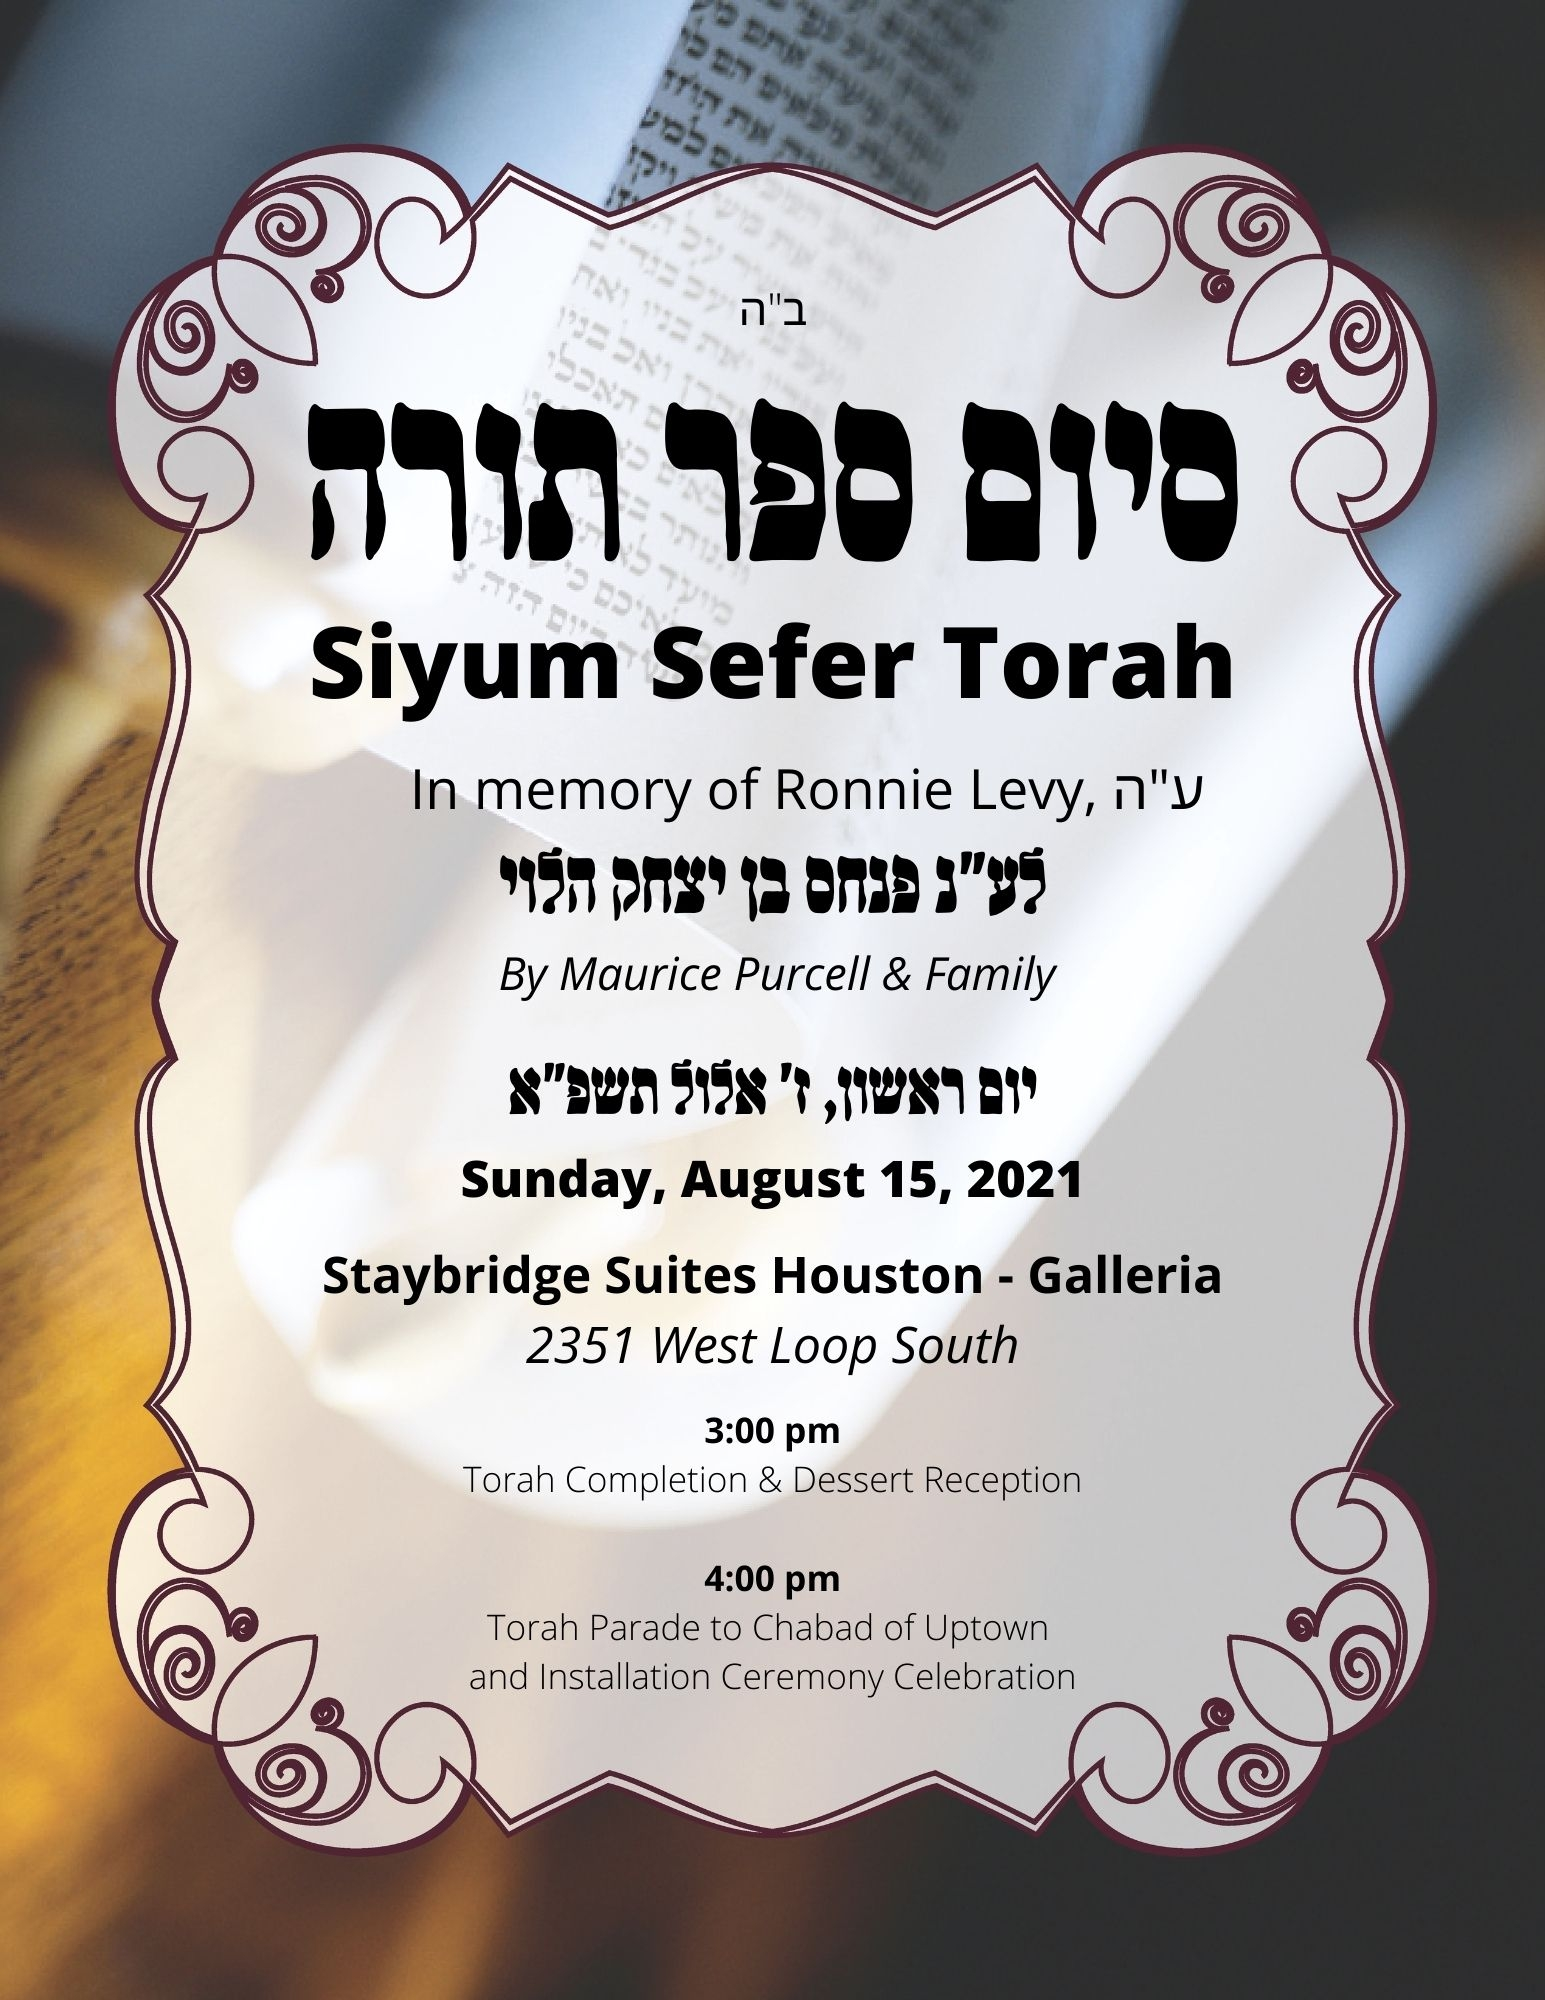 Uptown Sefer Torah Completion & Dedication | Sun. Aug 15 3 pm | Staybridge Suites - Galleria